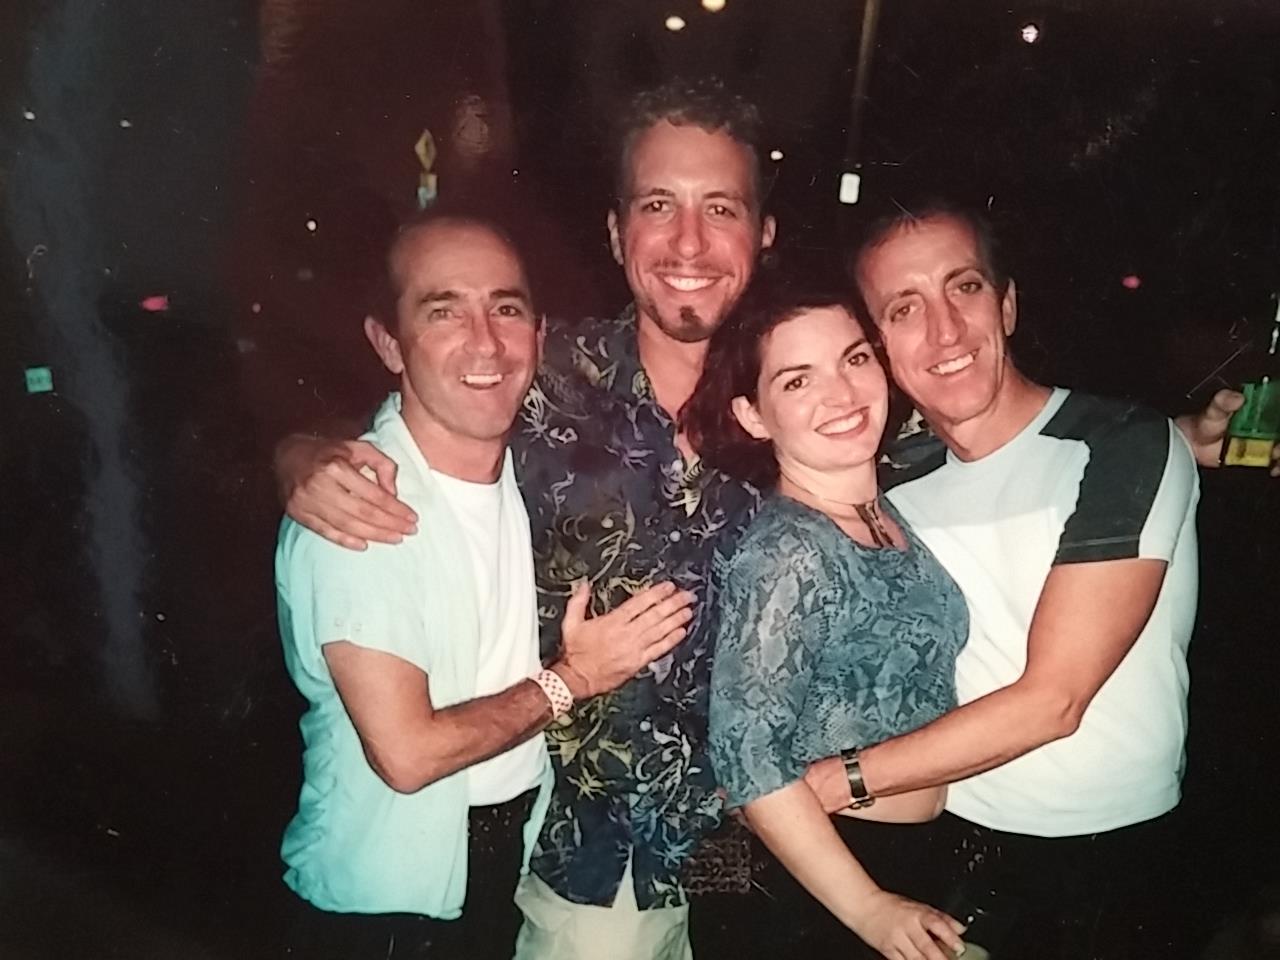 Jon Gentry, 2001, The Pirates of Penzance. Jon, John Holley, Melanie Gray Robinson, Roger Preston Smith.